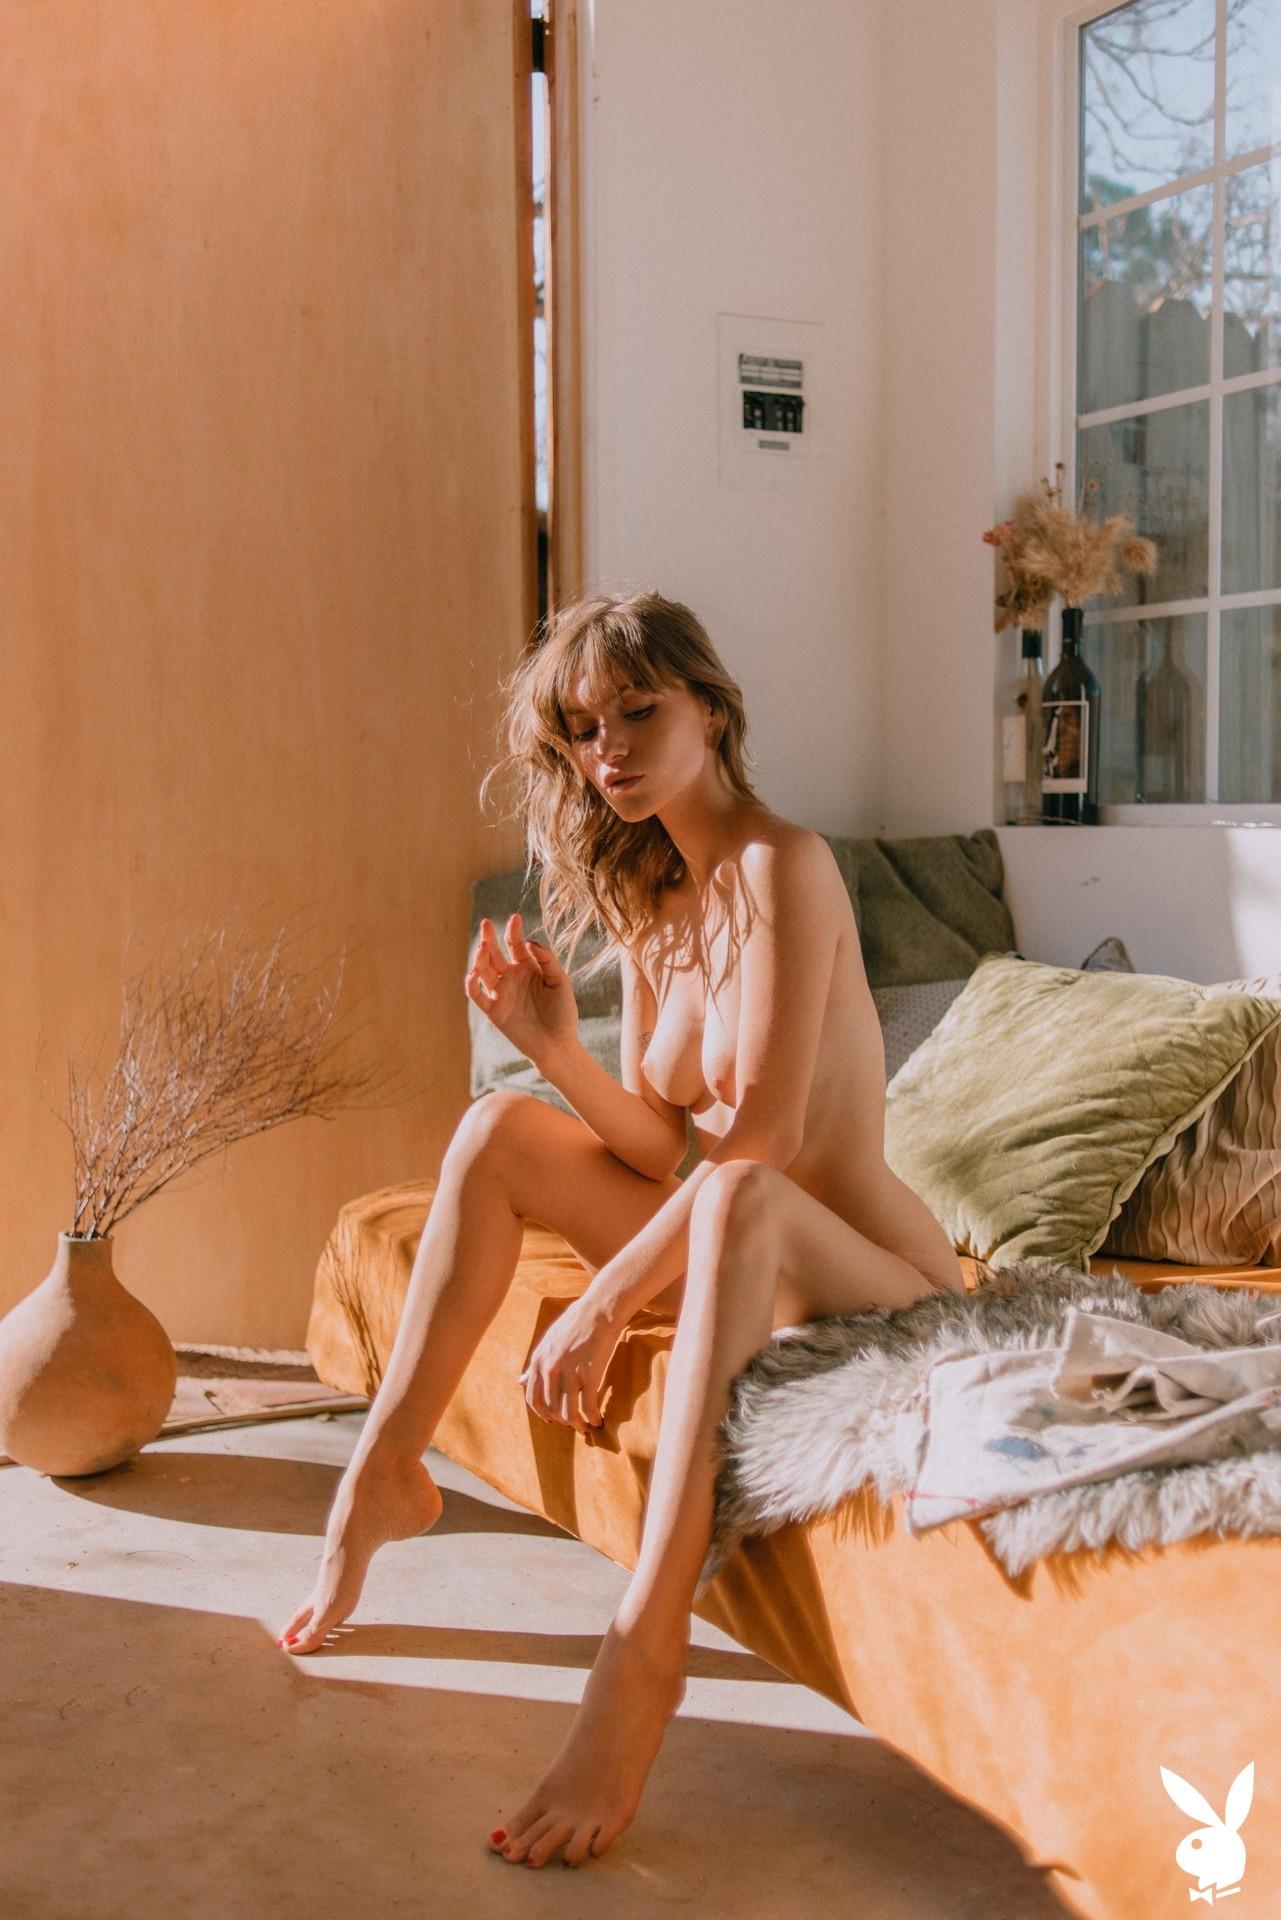 Nastasia Celeste In Creative Space Playboy Plus (23)